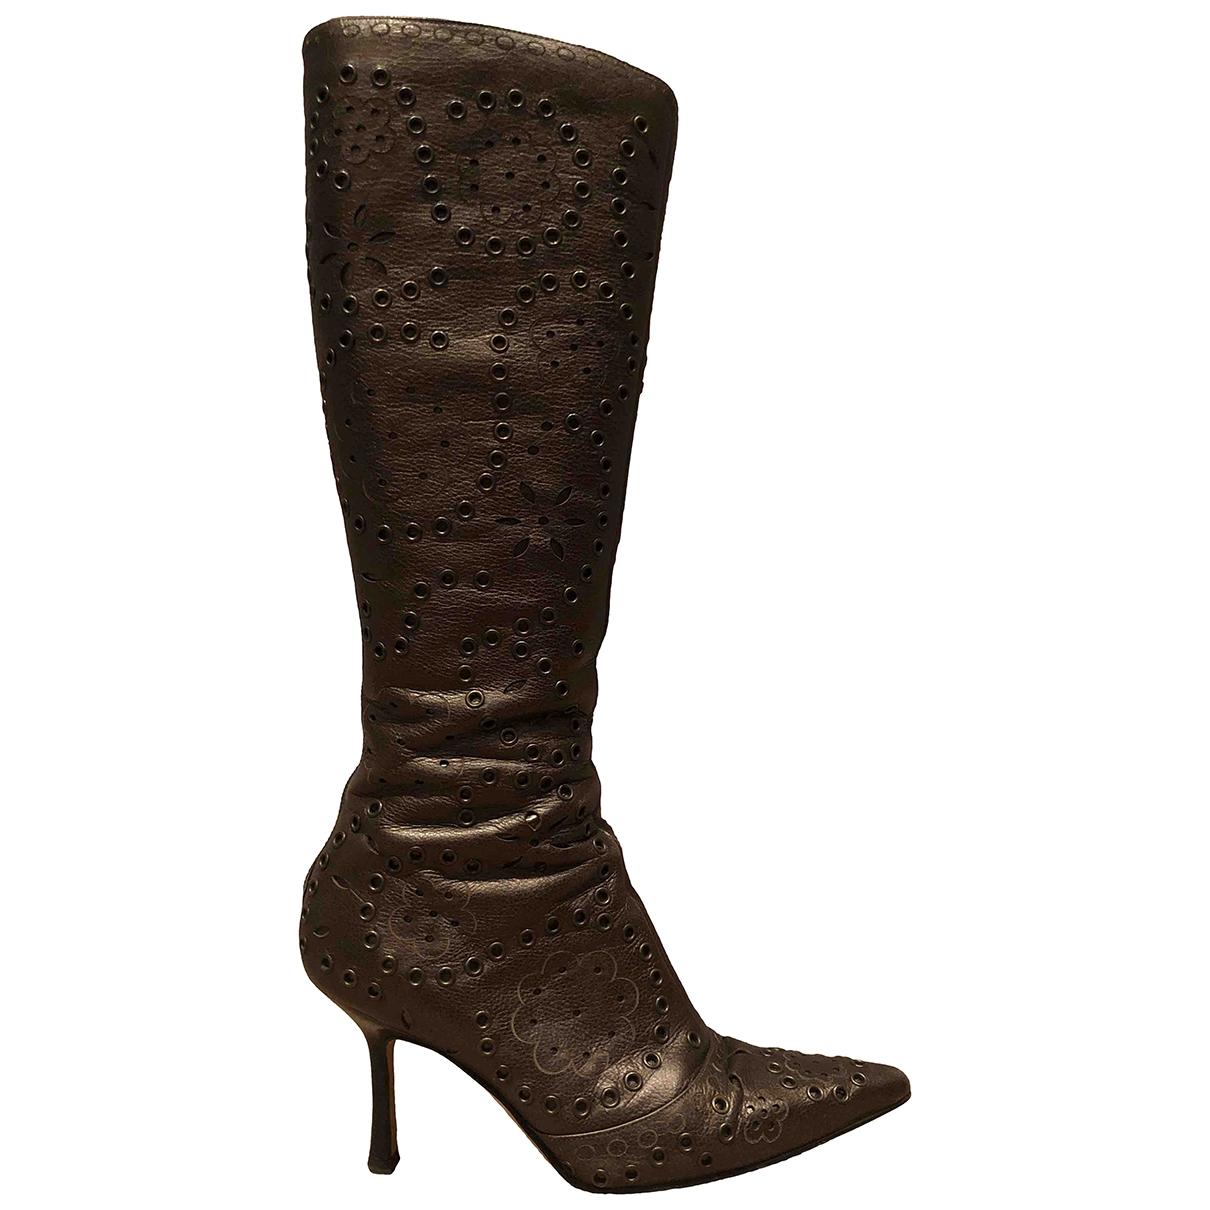 Jimmy Choo N Metallic Leather Boots for Women 38 EU